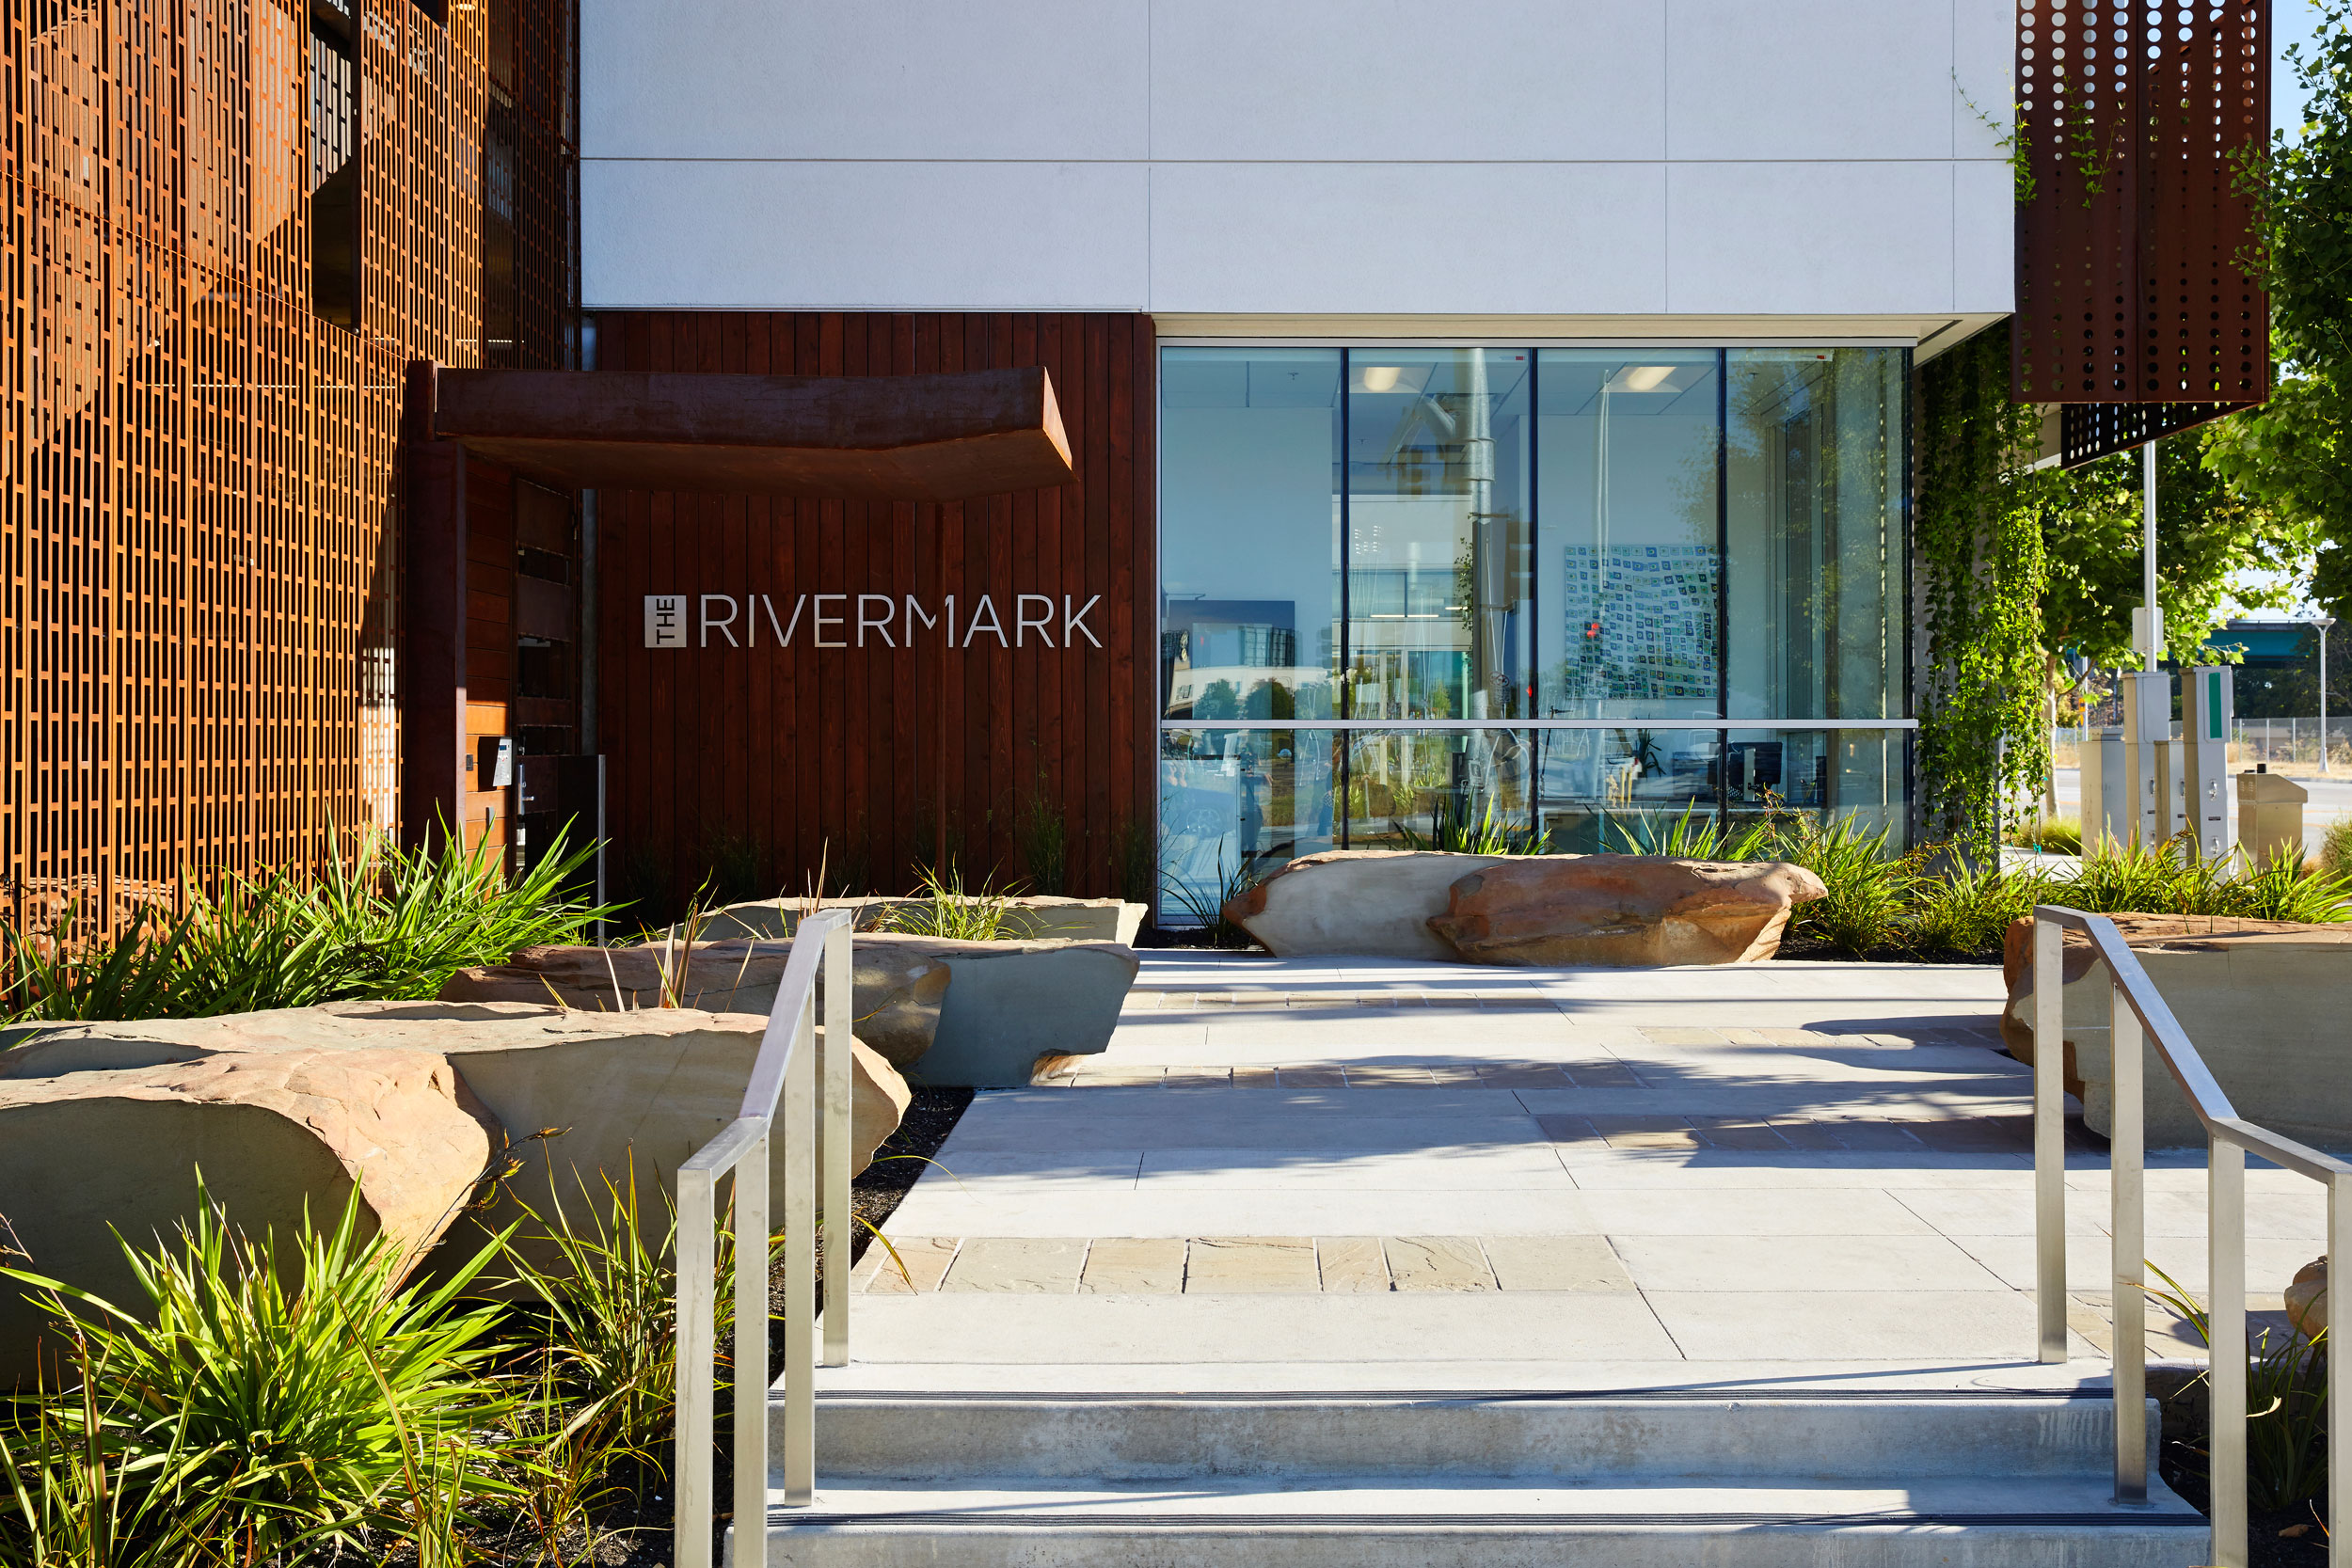 Rivermark-13.jpg